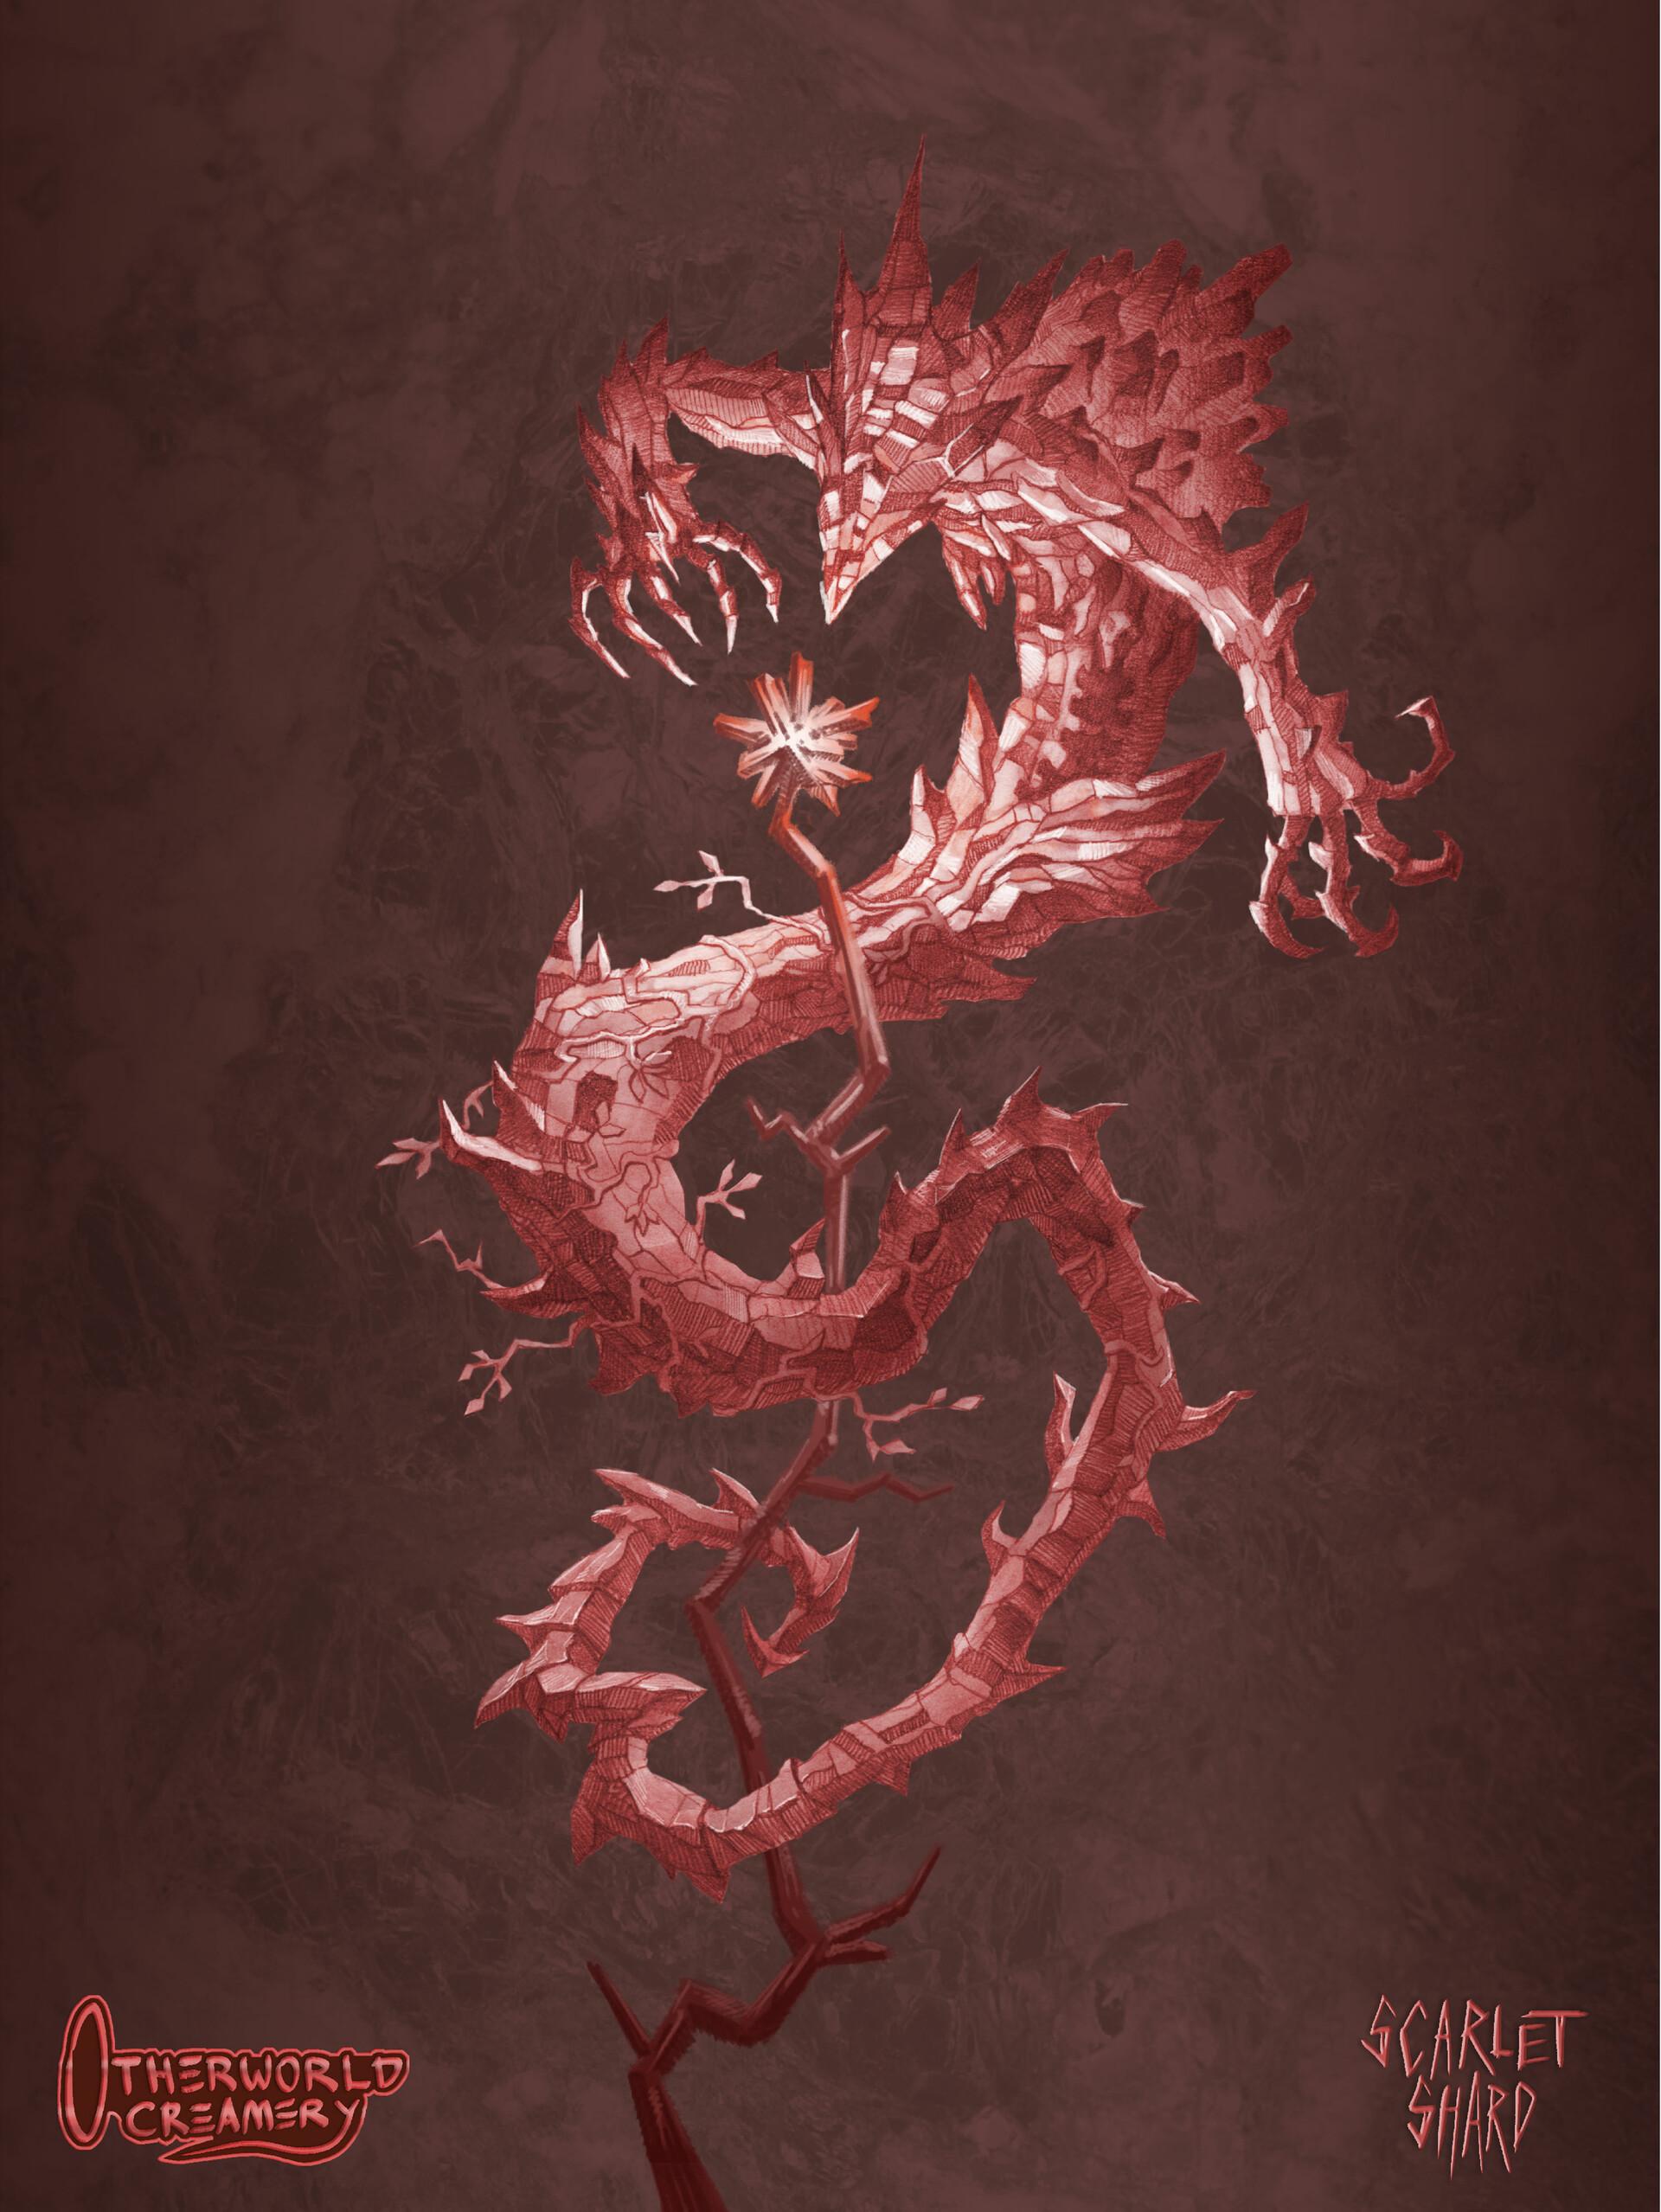 Scarlet Shard